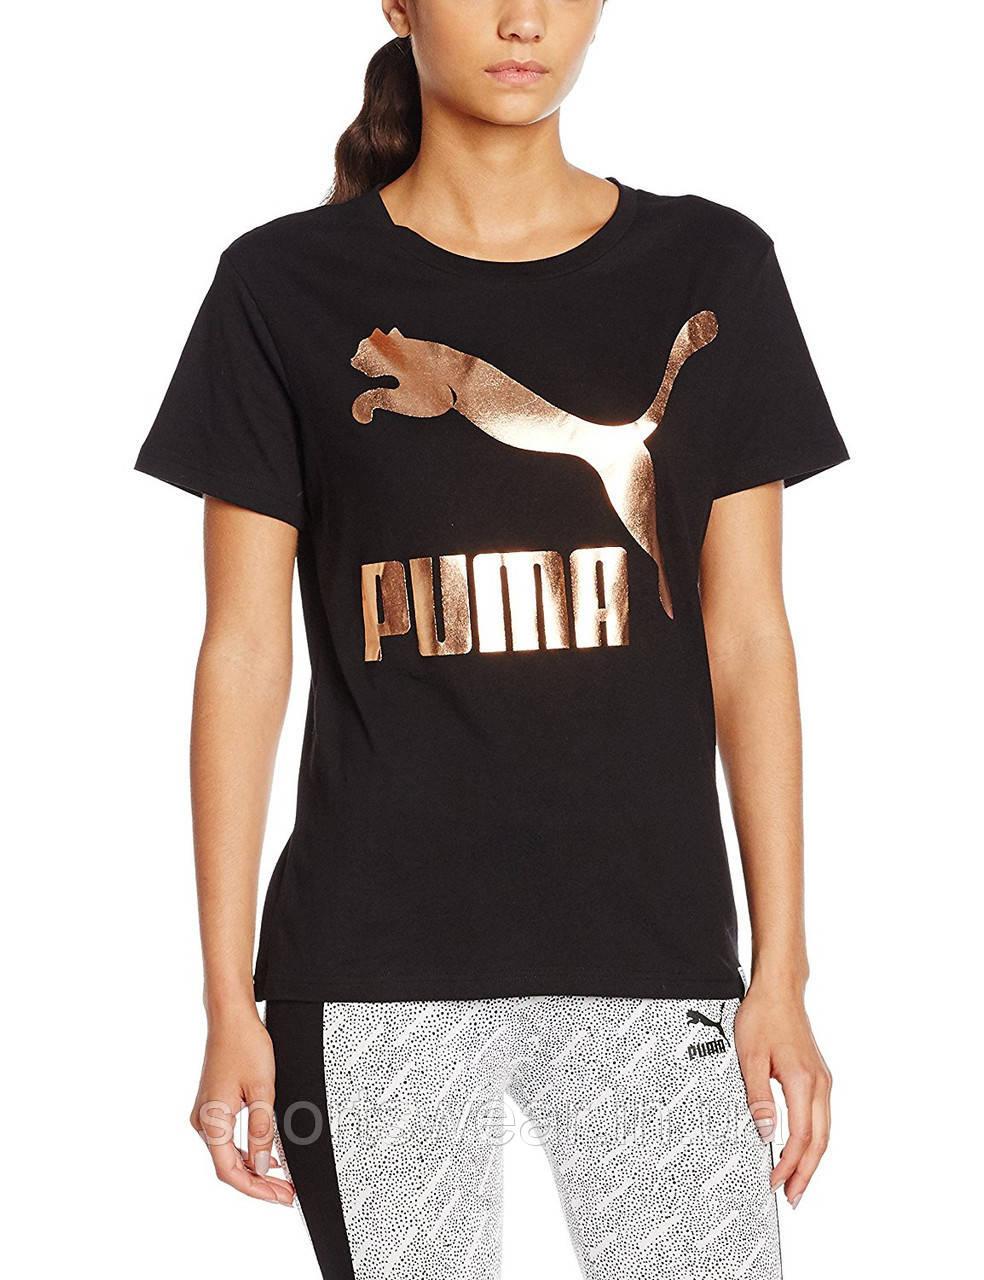 fa0e99a520b76 Футболка Женская Puma Classic женская ( Черная )